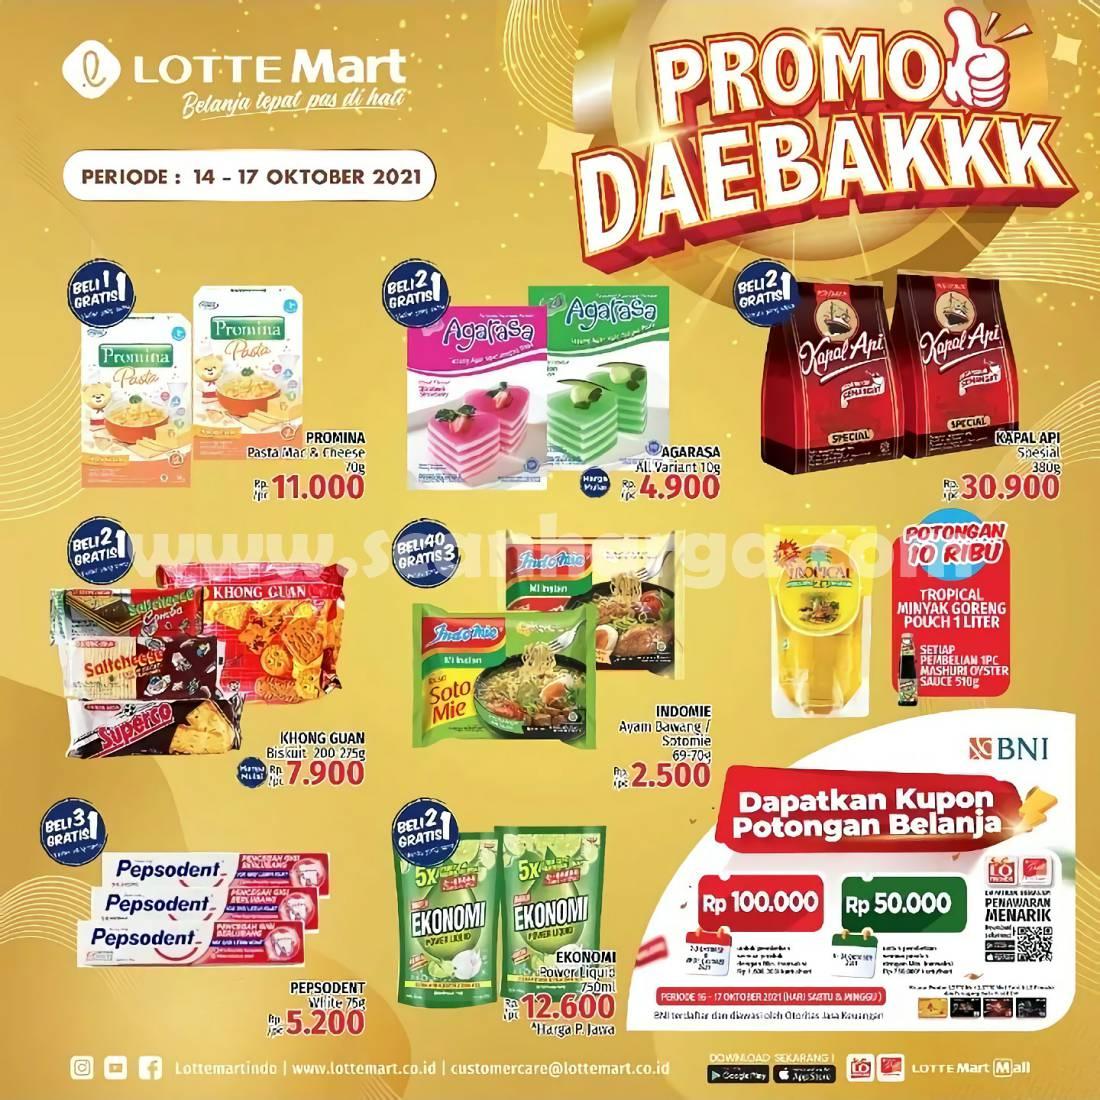 Katalog Promo JSM Lottemart Weekend Periode 14 - 17 Oktober 2021